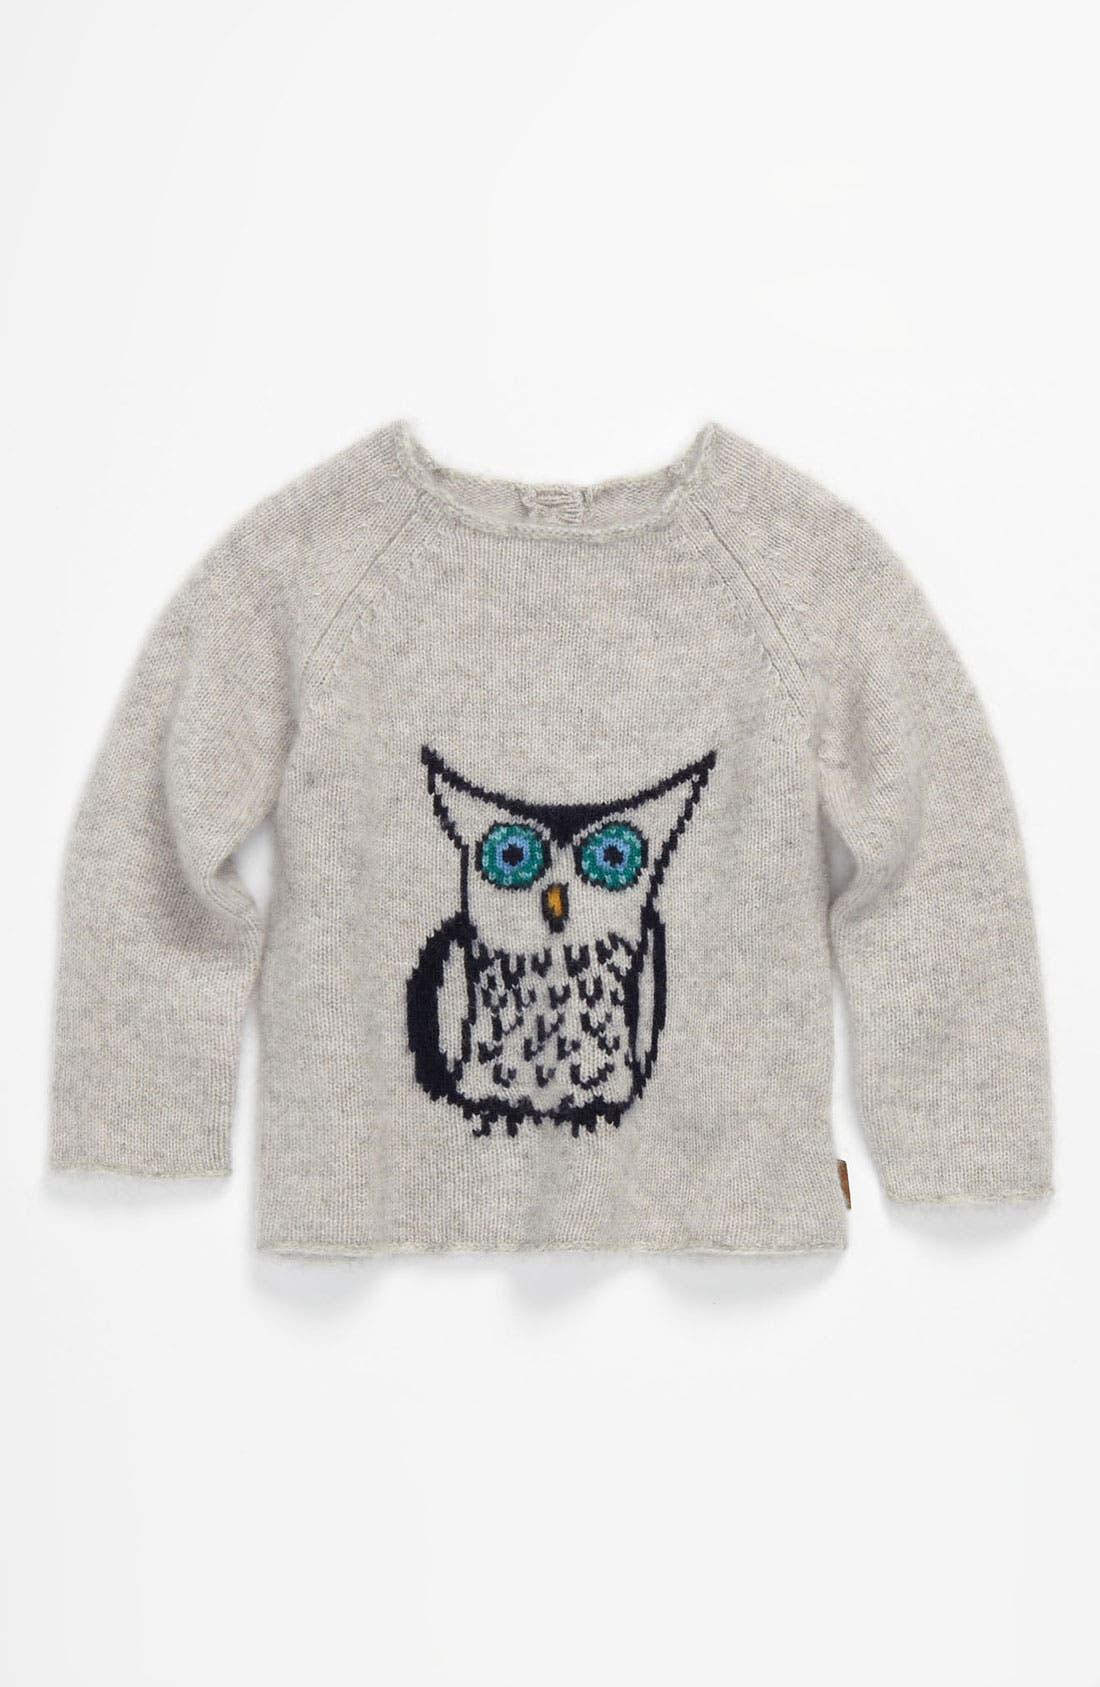 Alternate Image 1 Selected - Burberry 'Tova' Owl Intarsia Cashmere Sweater (Infant)